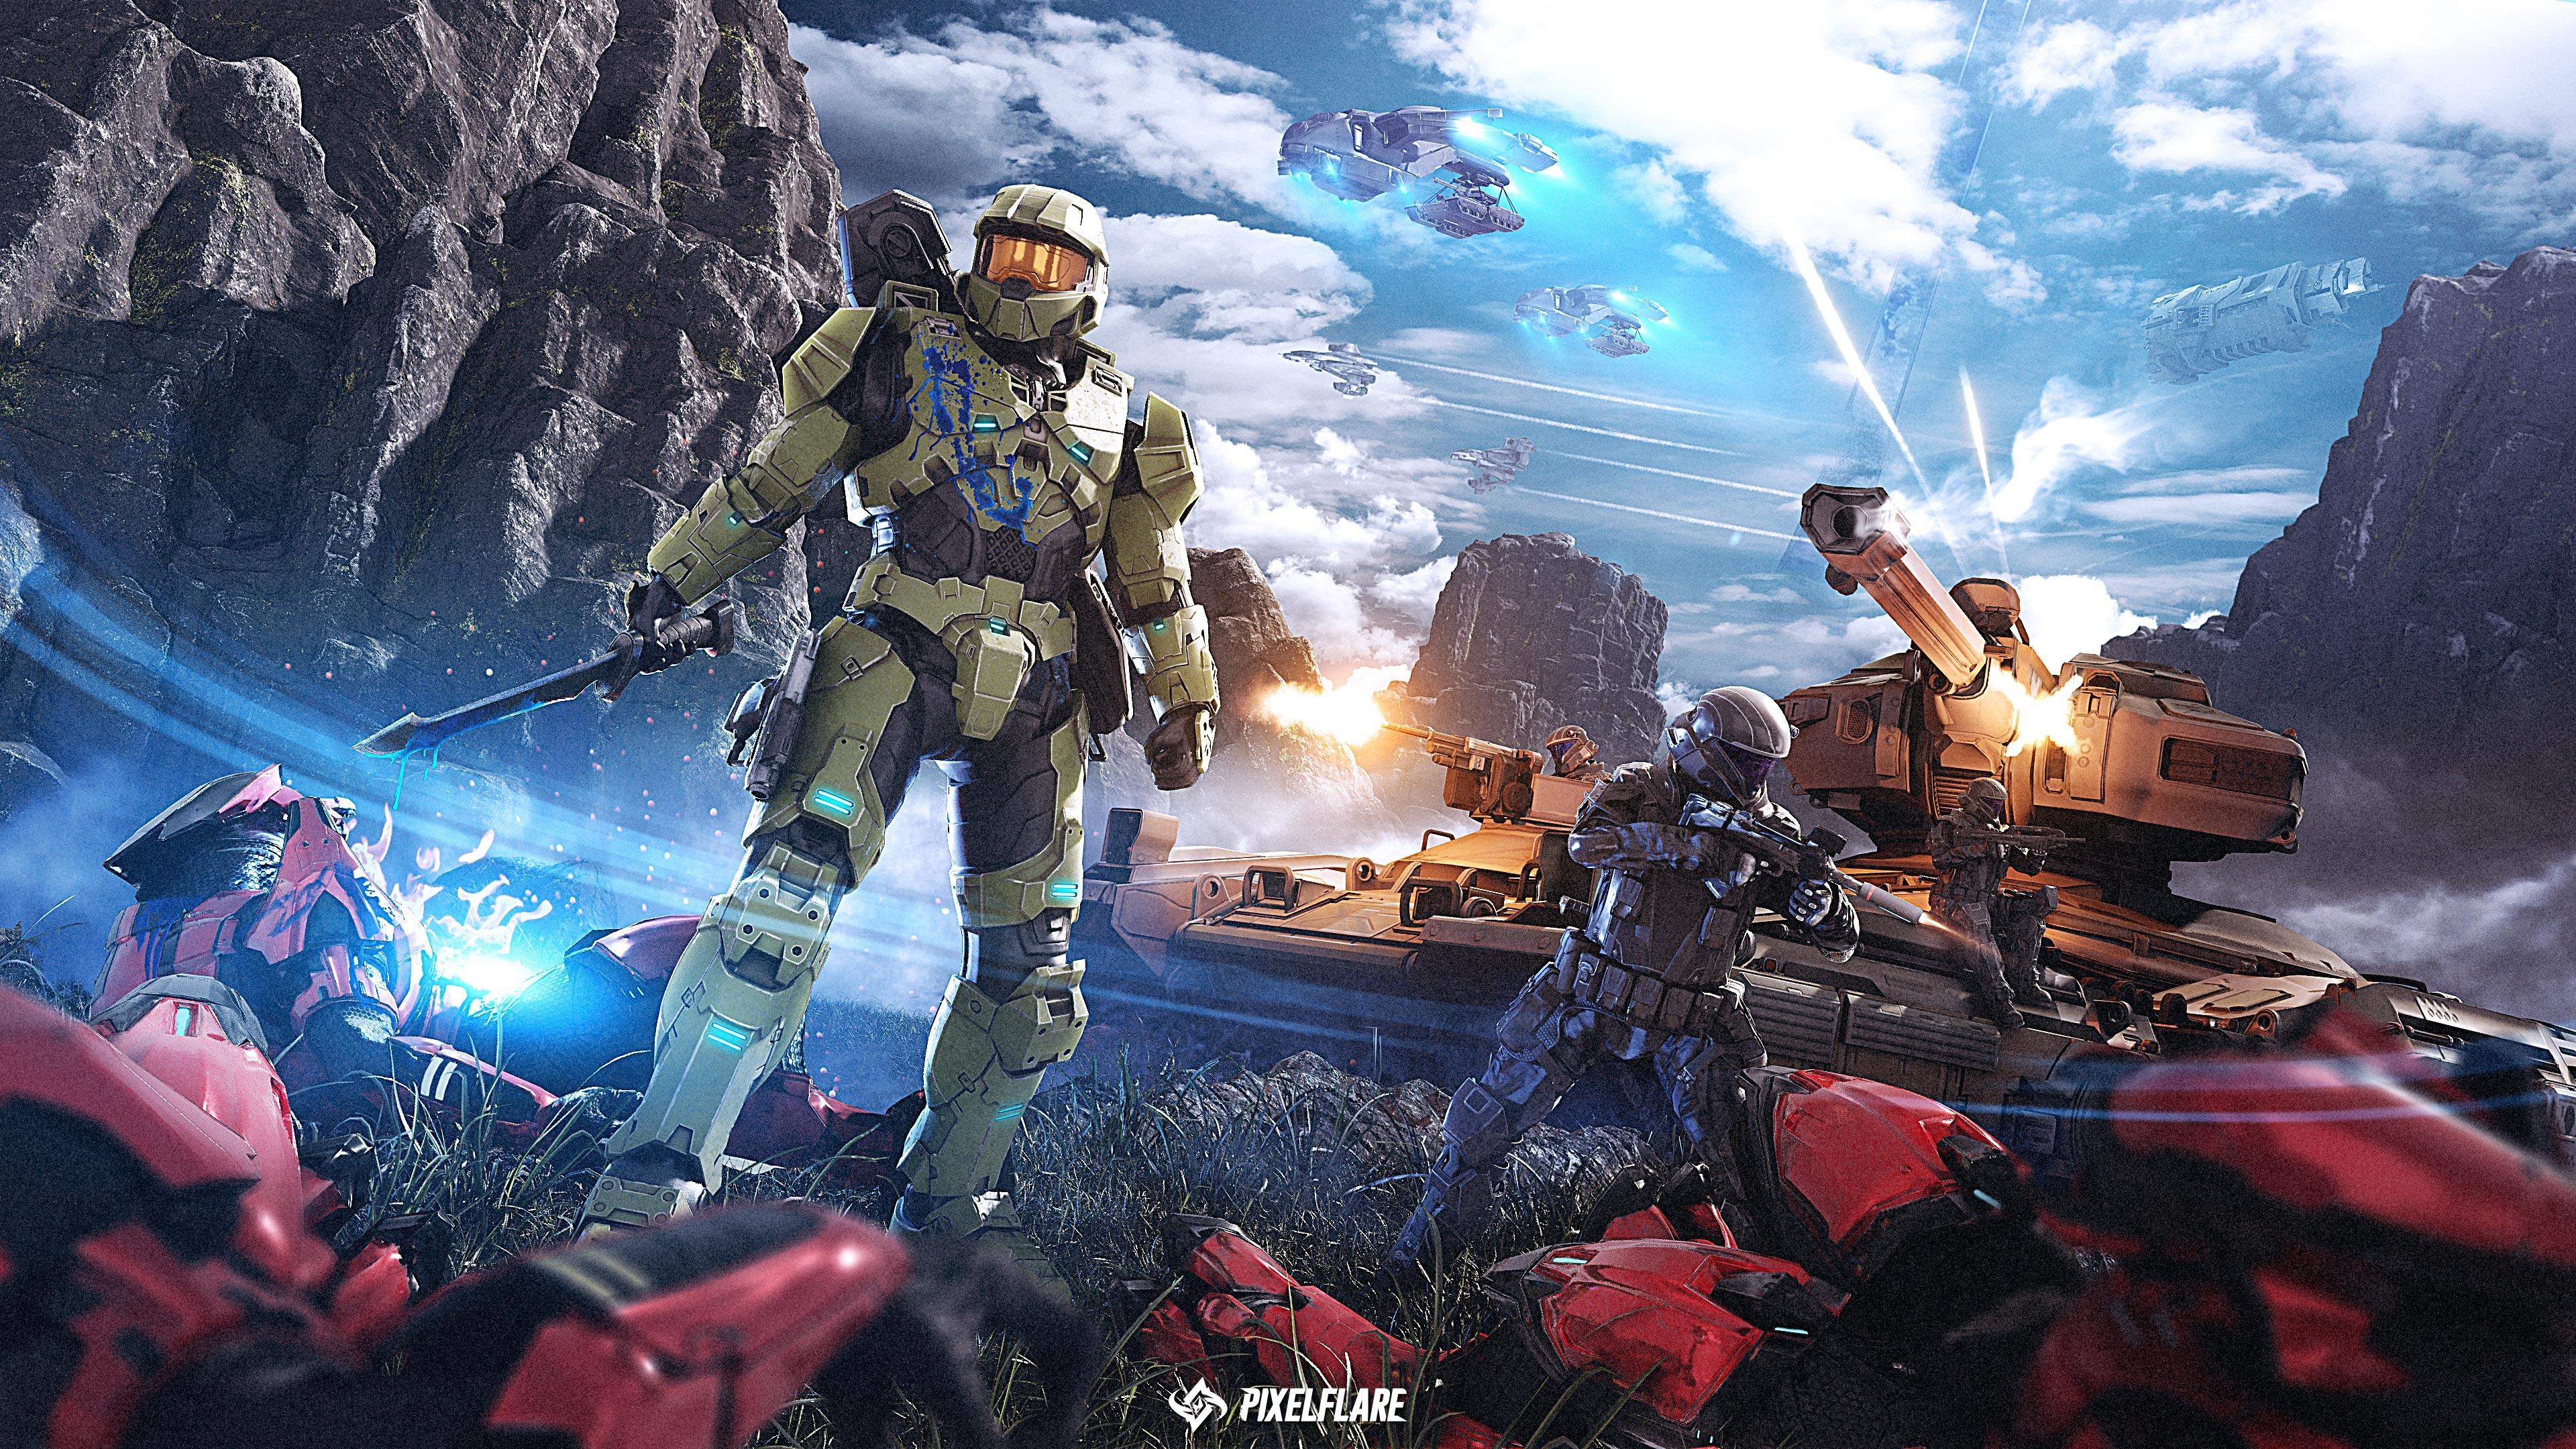 Halo Master Chief Wallpaper, HD Games 4K Wallpapers ...